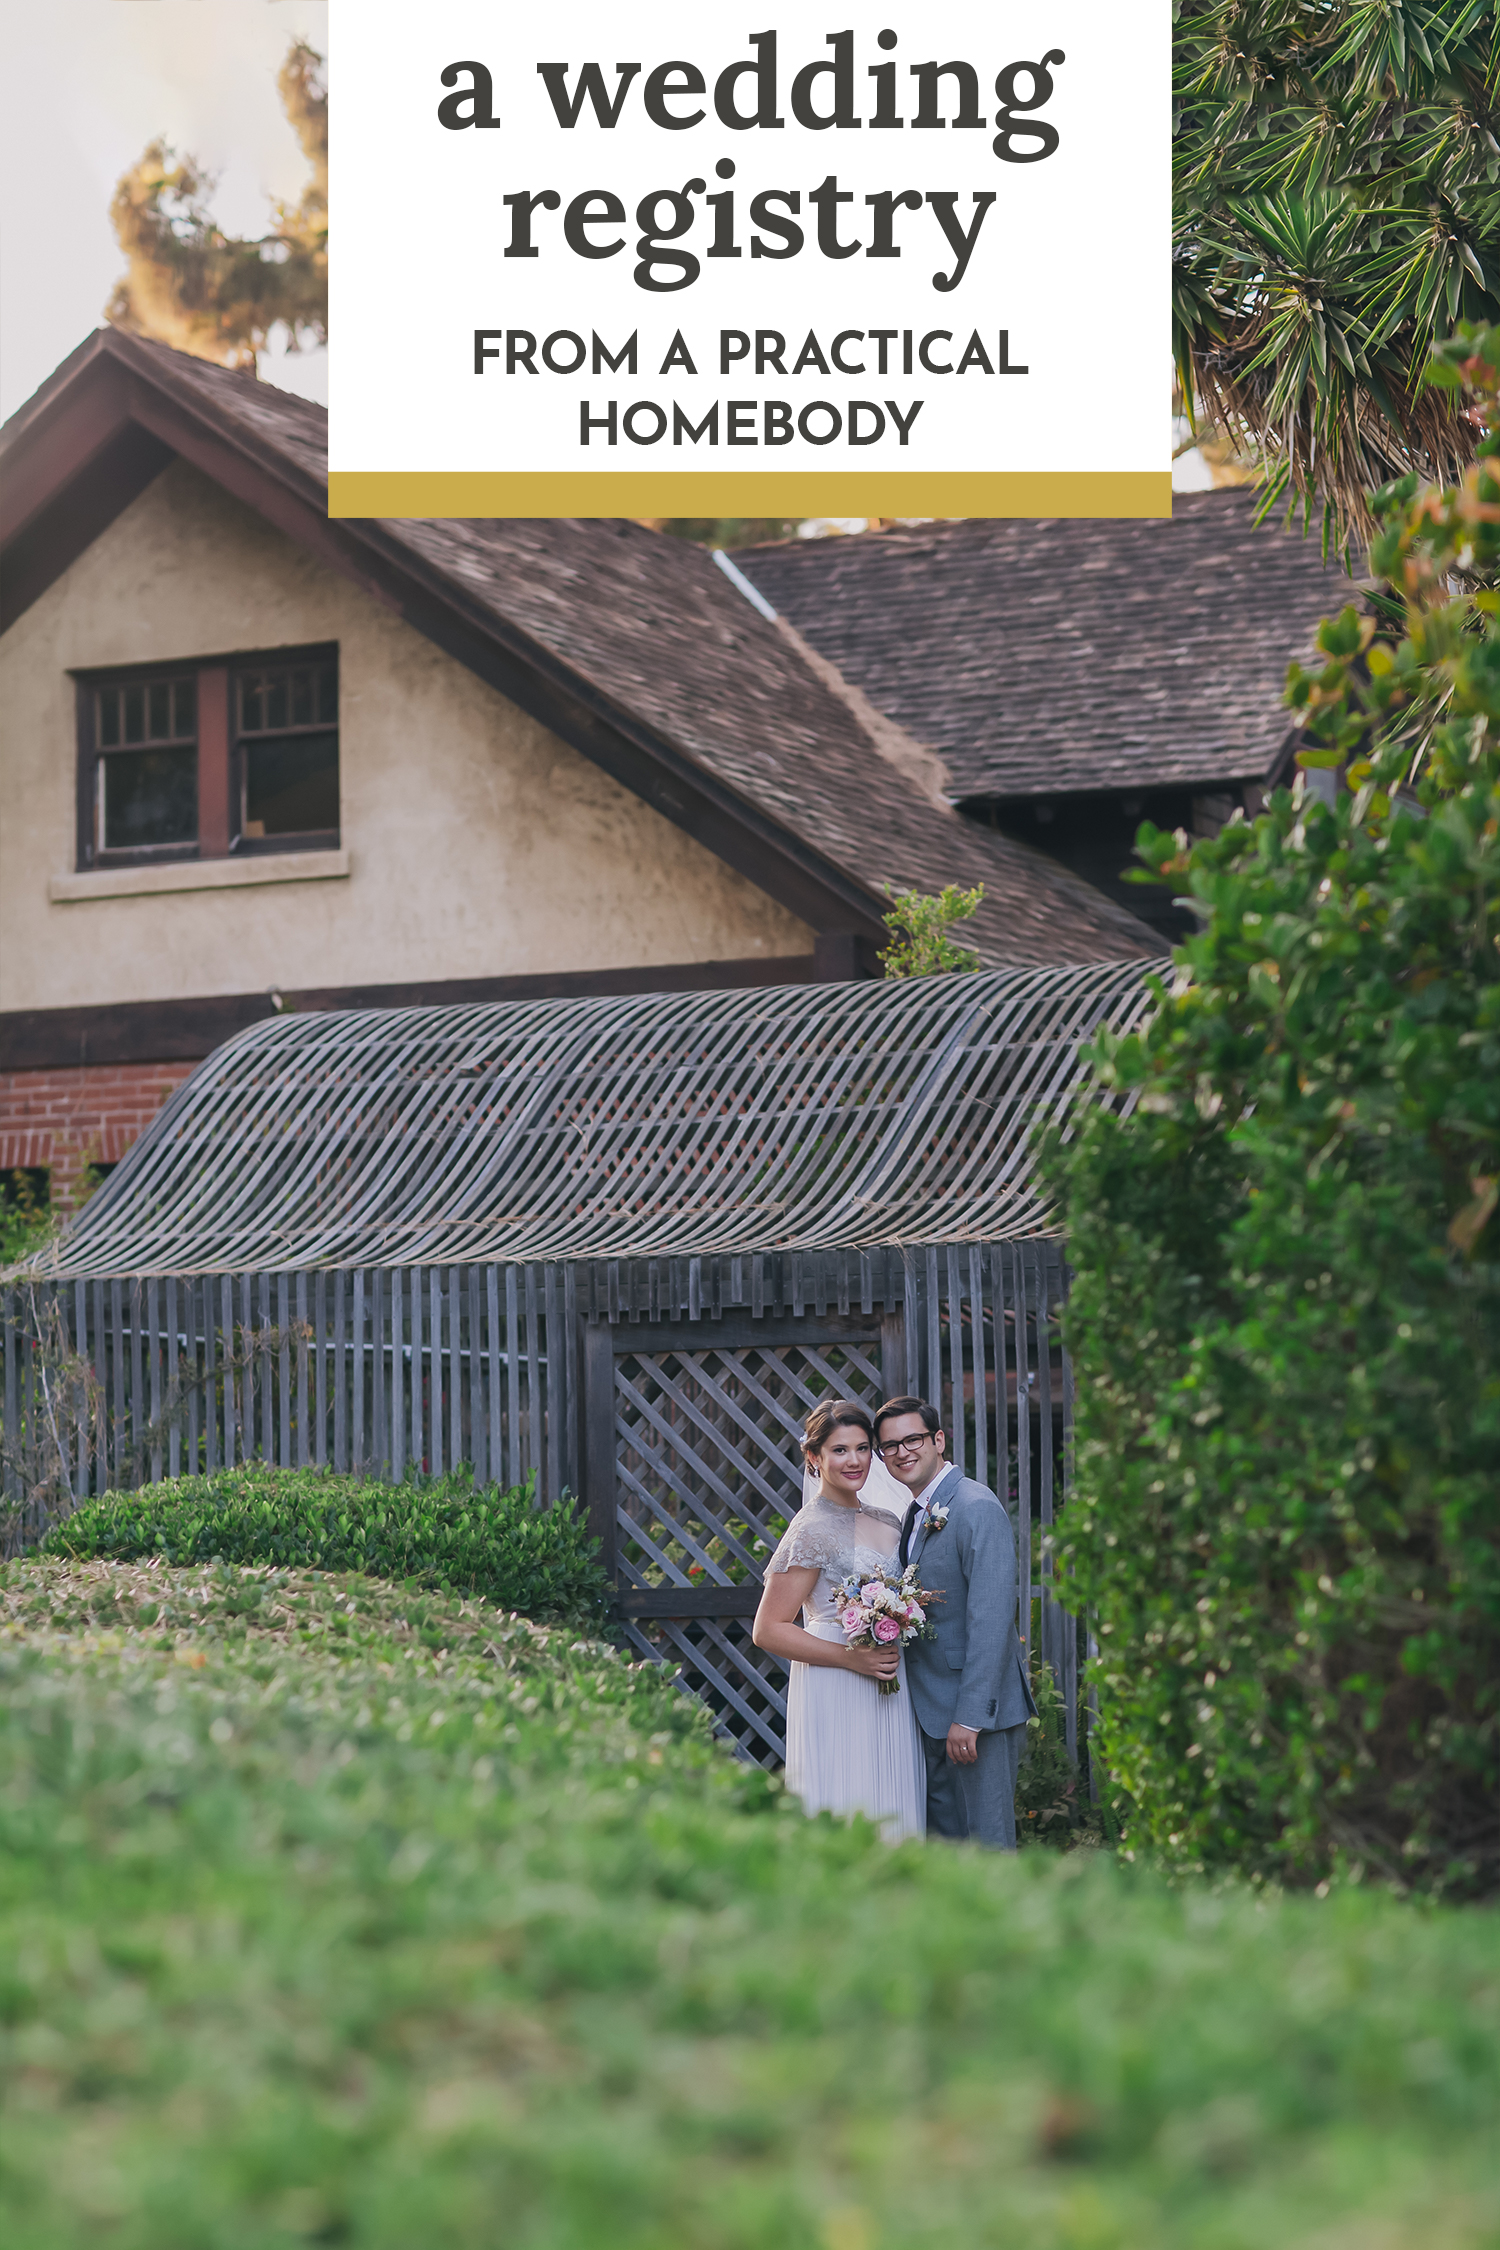 The Gold Hive Wedding Registry Practical Utilitarian DIY Homebody Tools Renovator.jpg